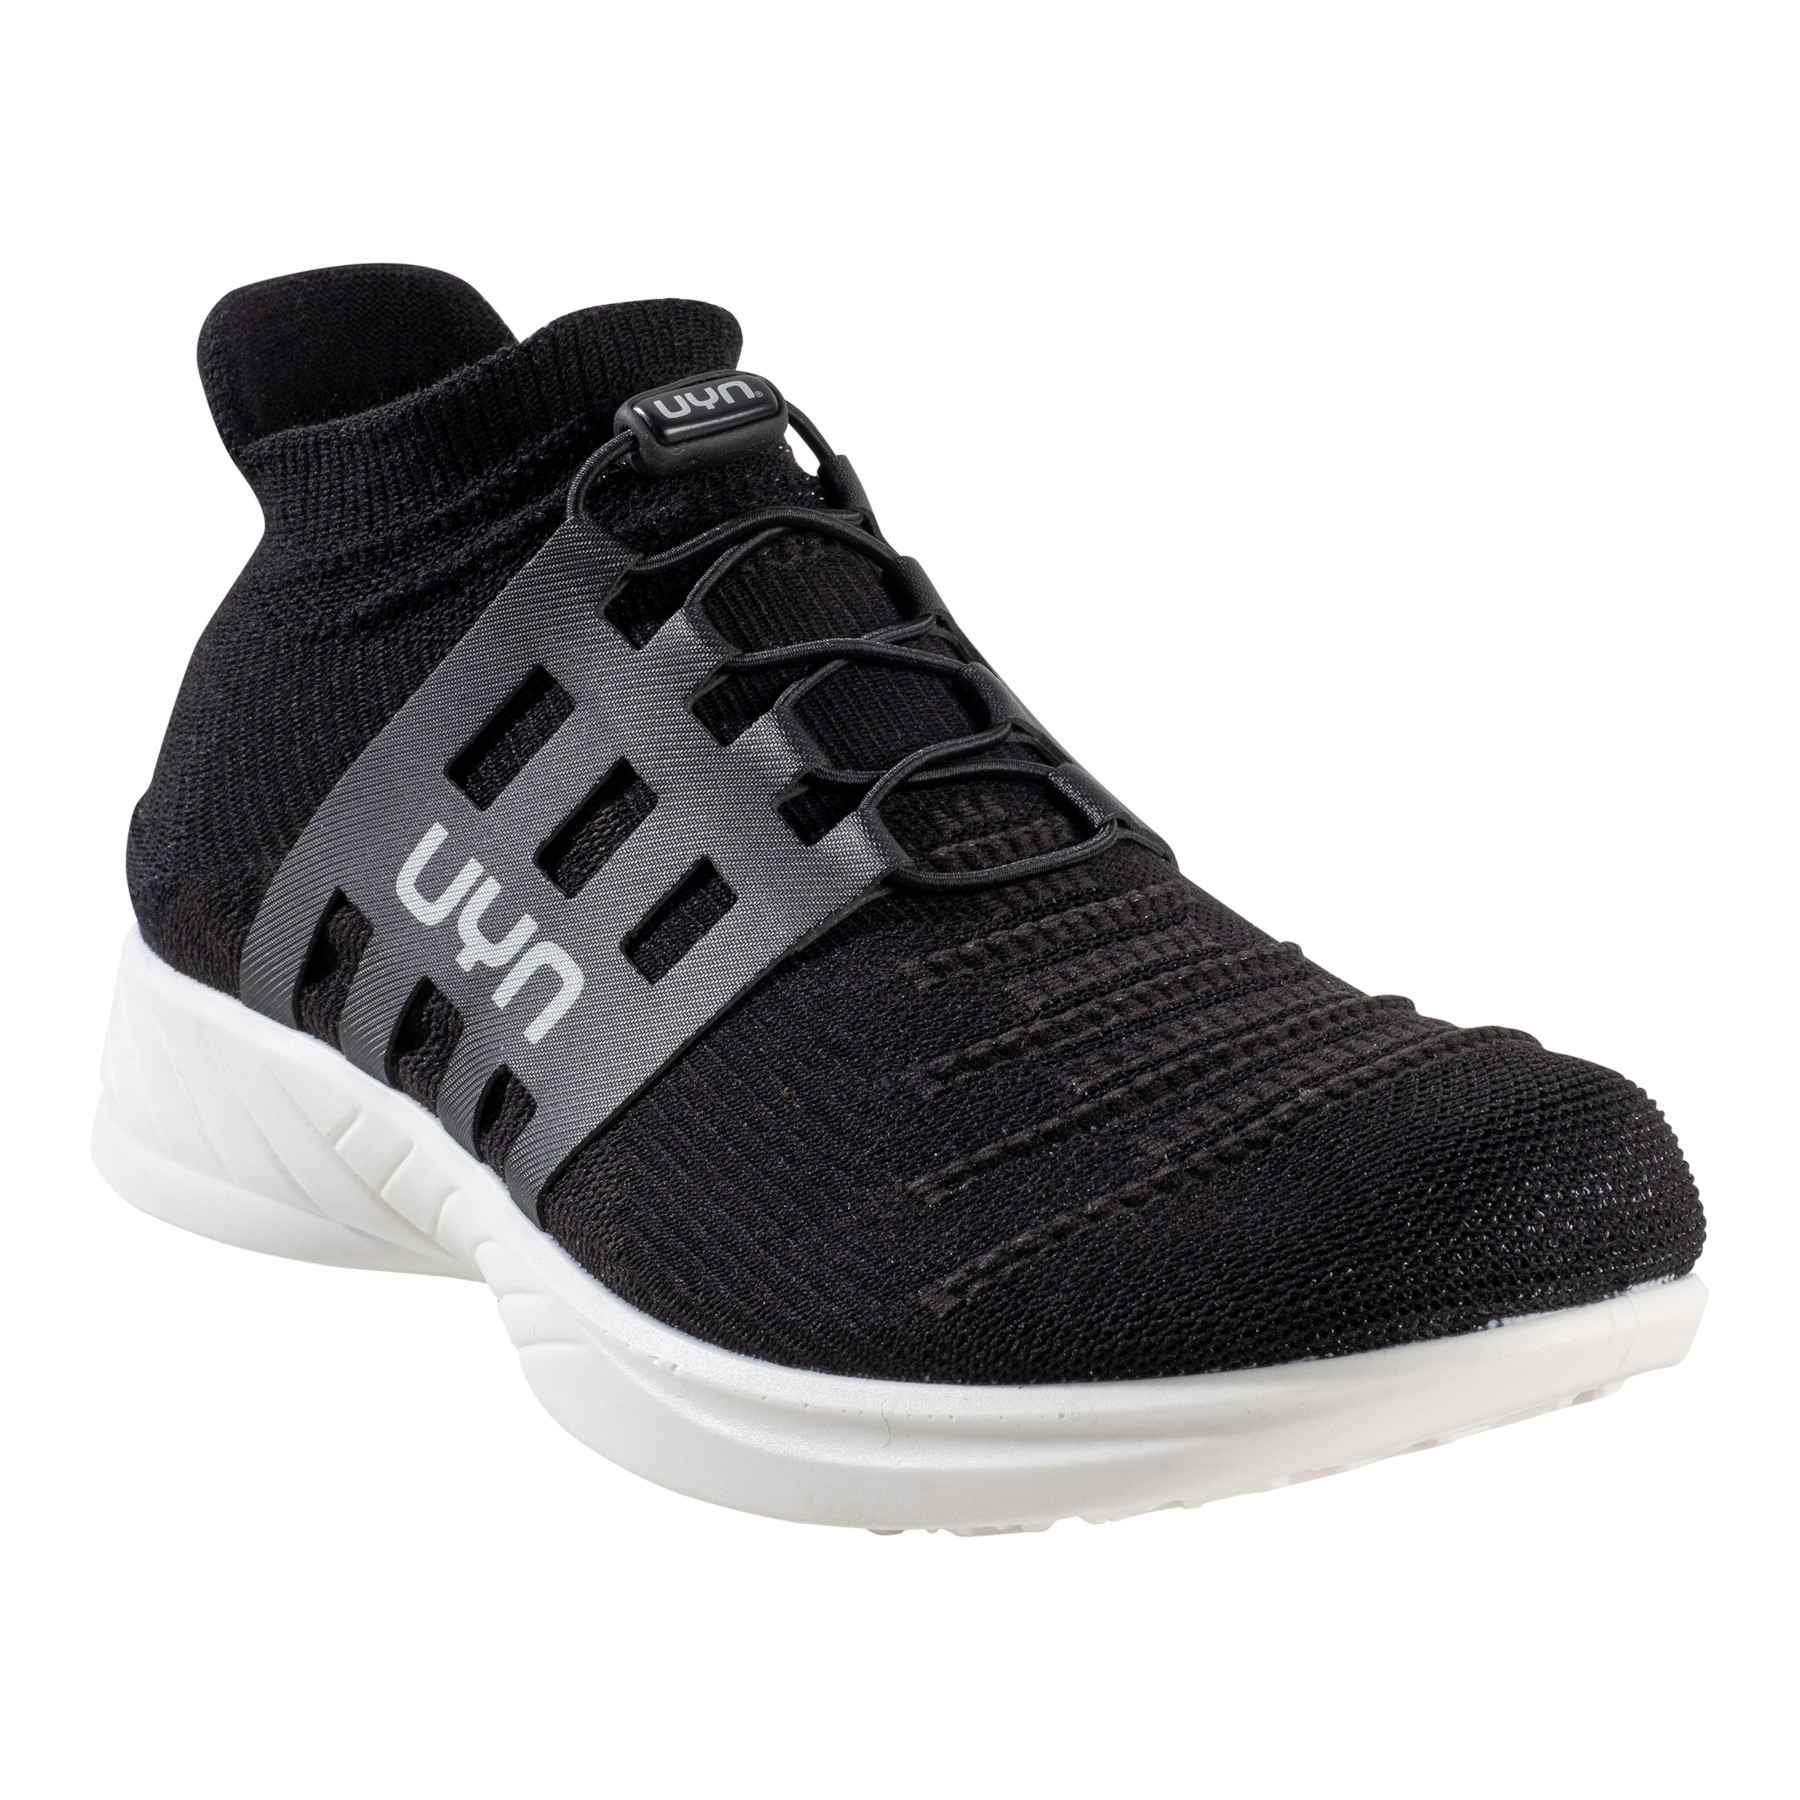 UYN X-Cross Tune Man Running Shoes - Optical Black/Black